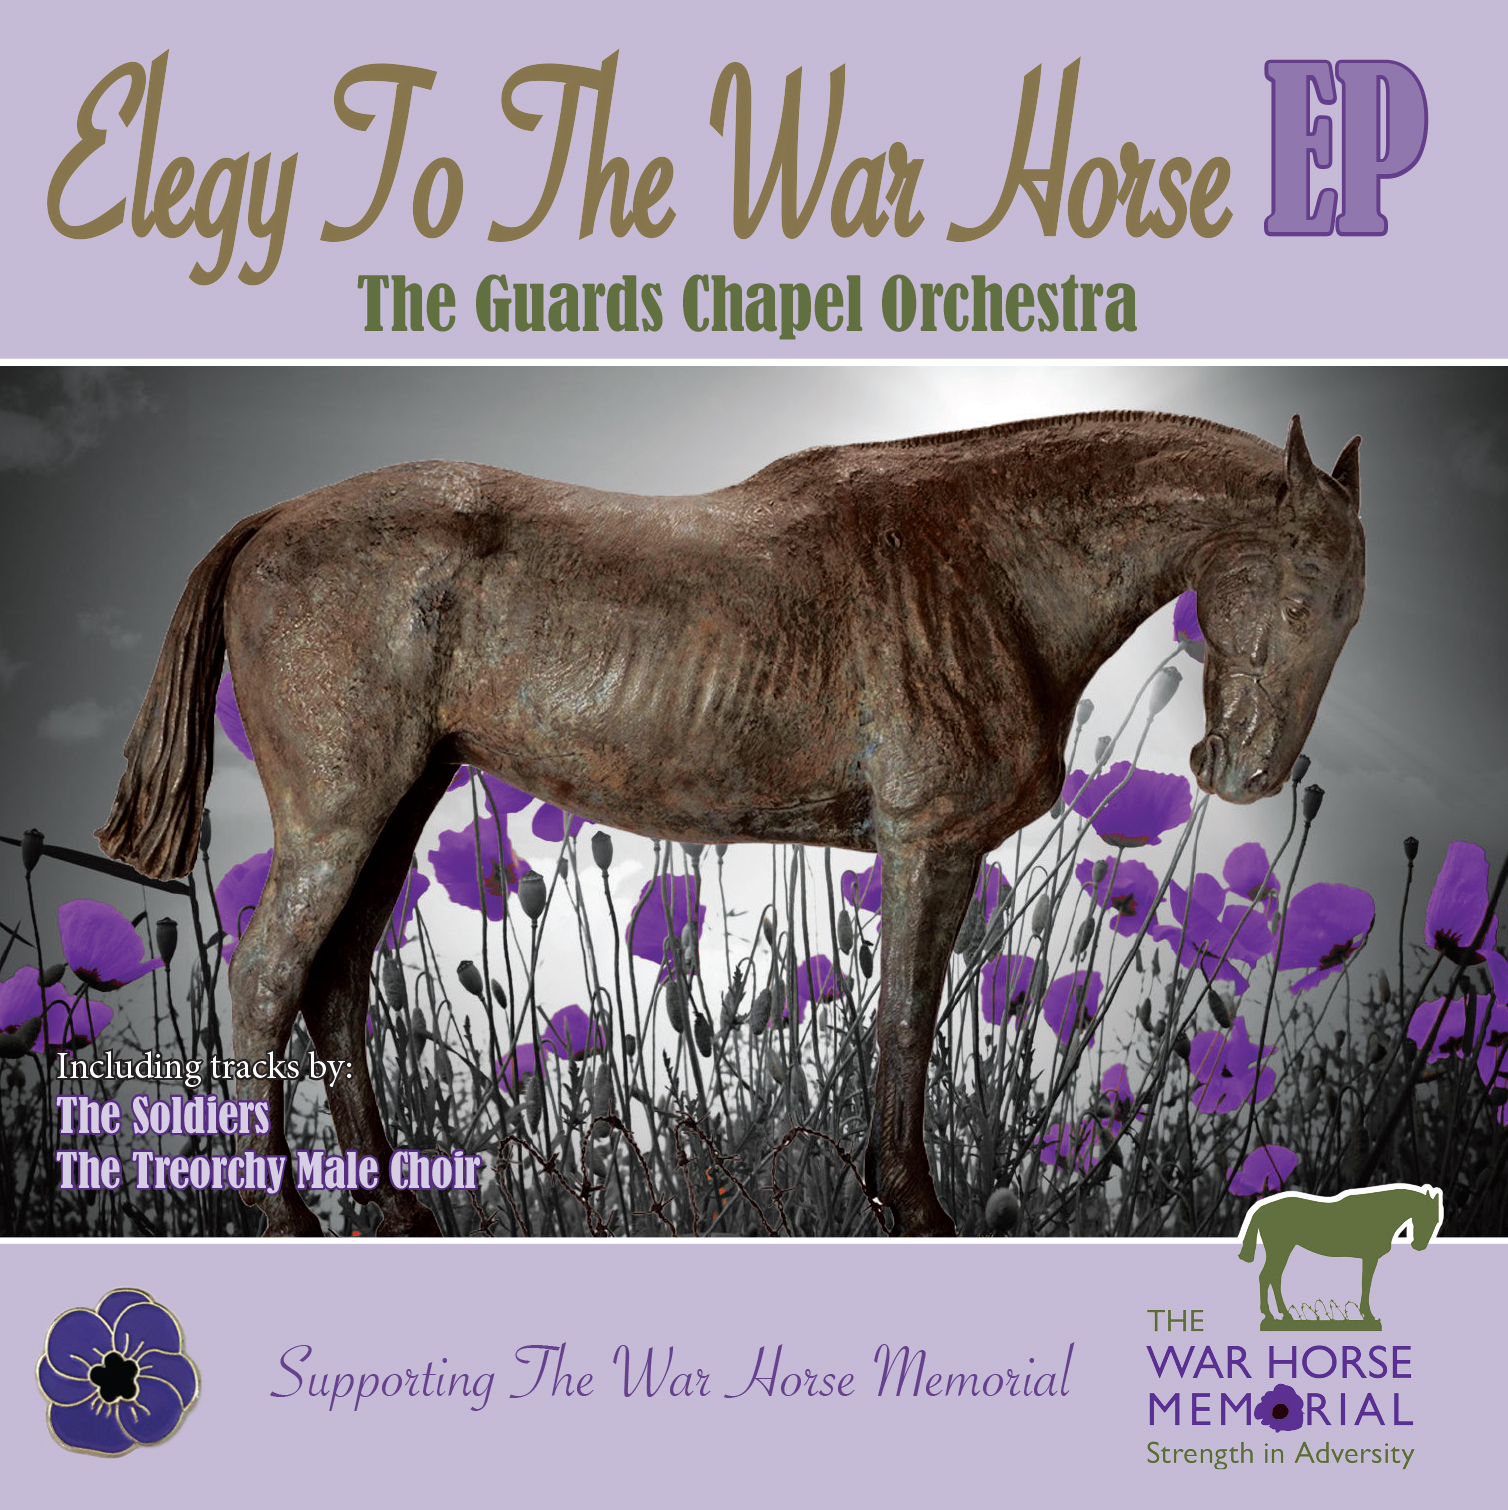 The War Horse Memorial